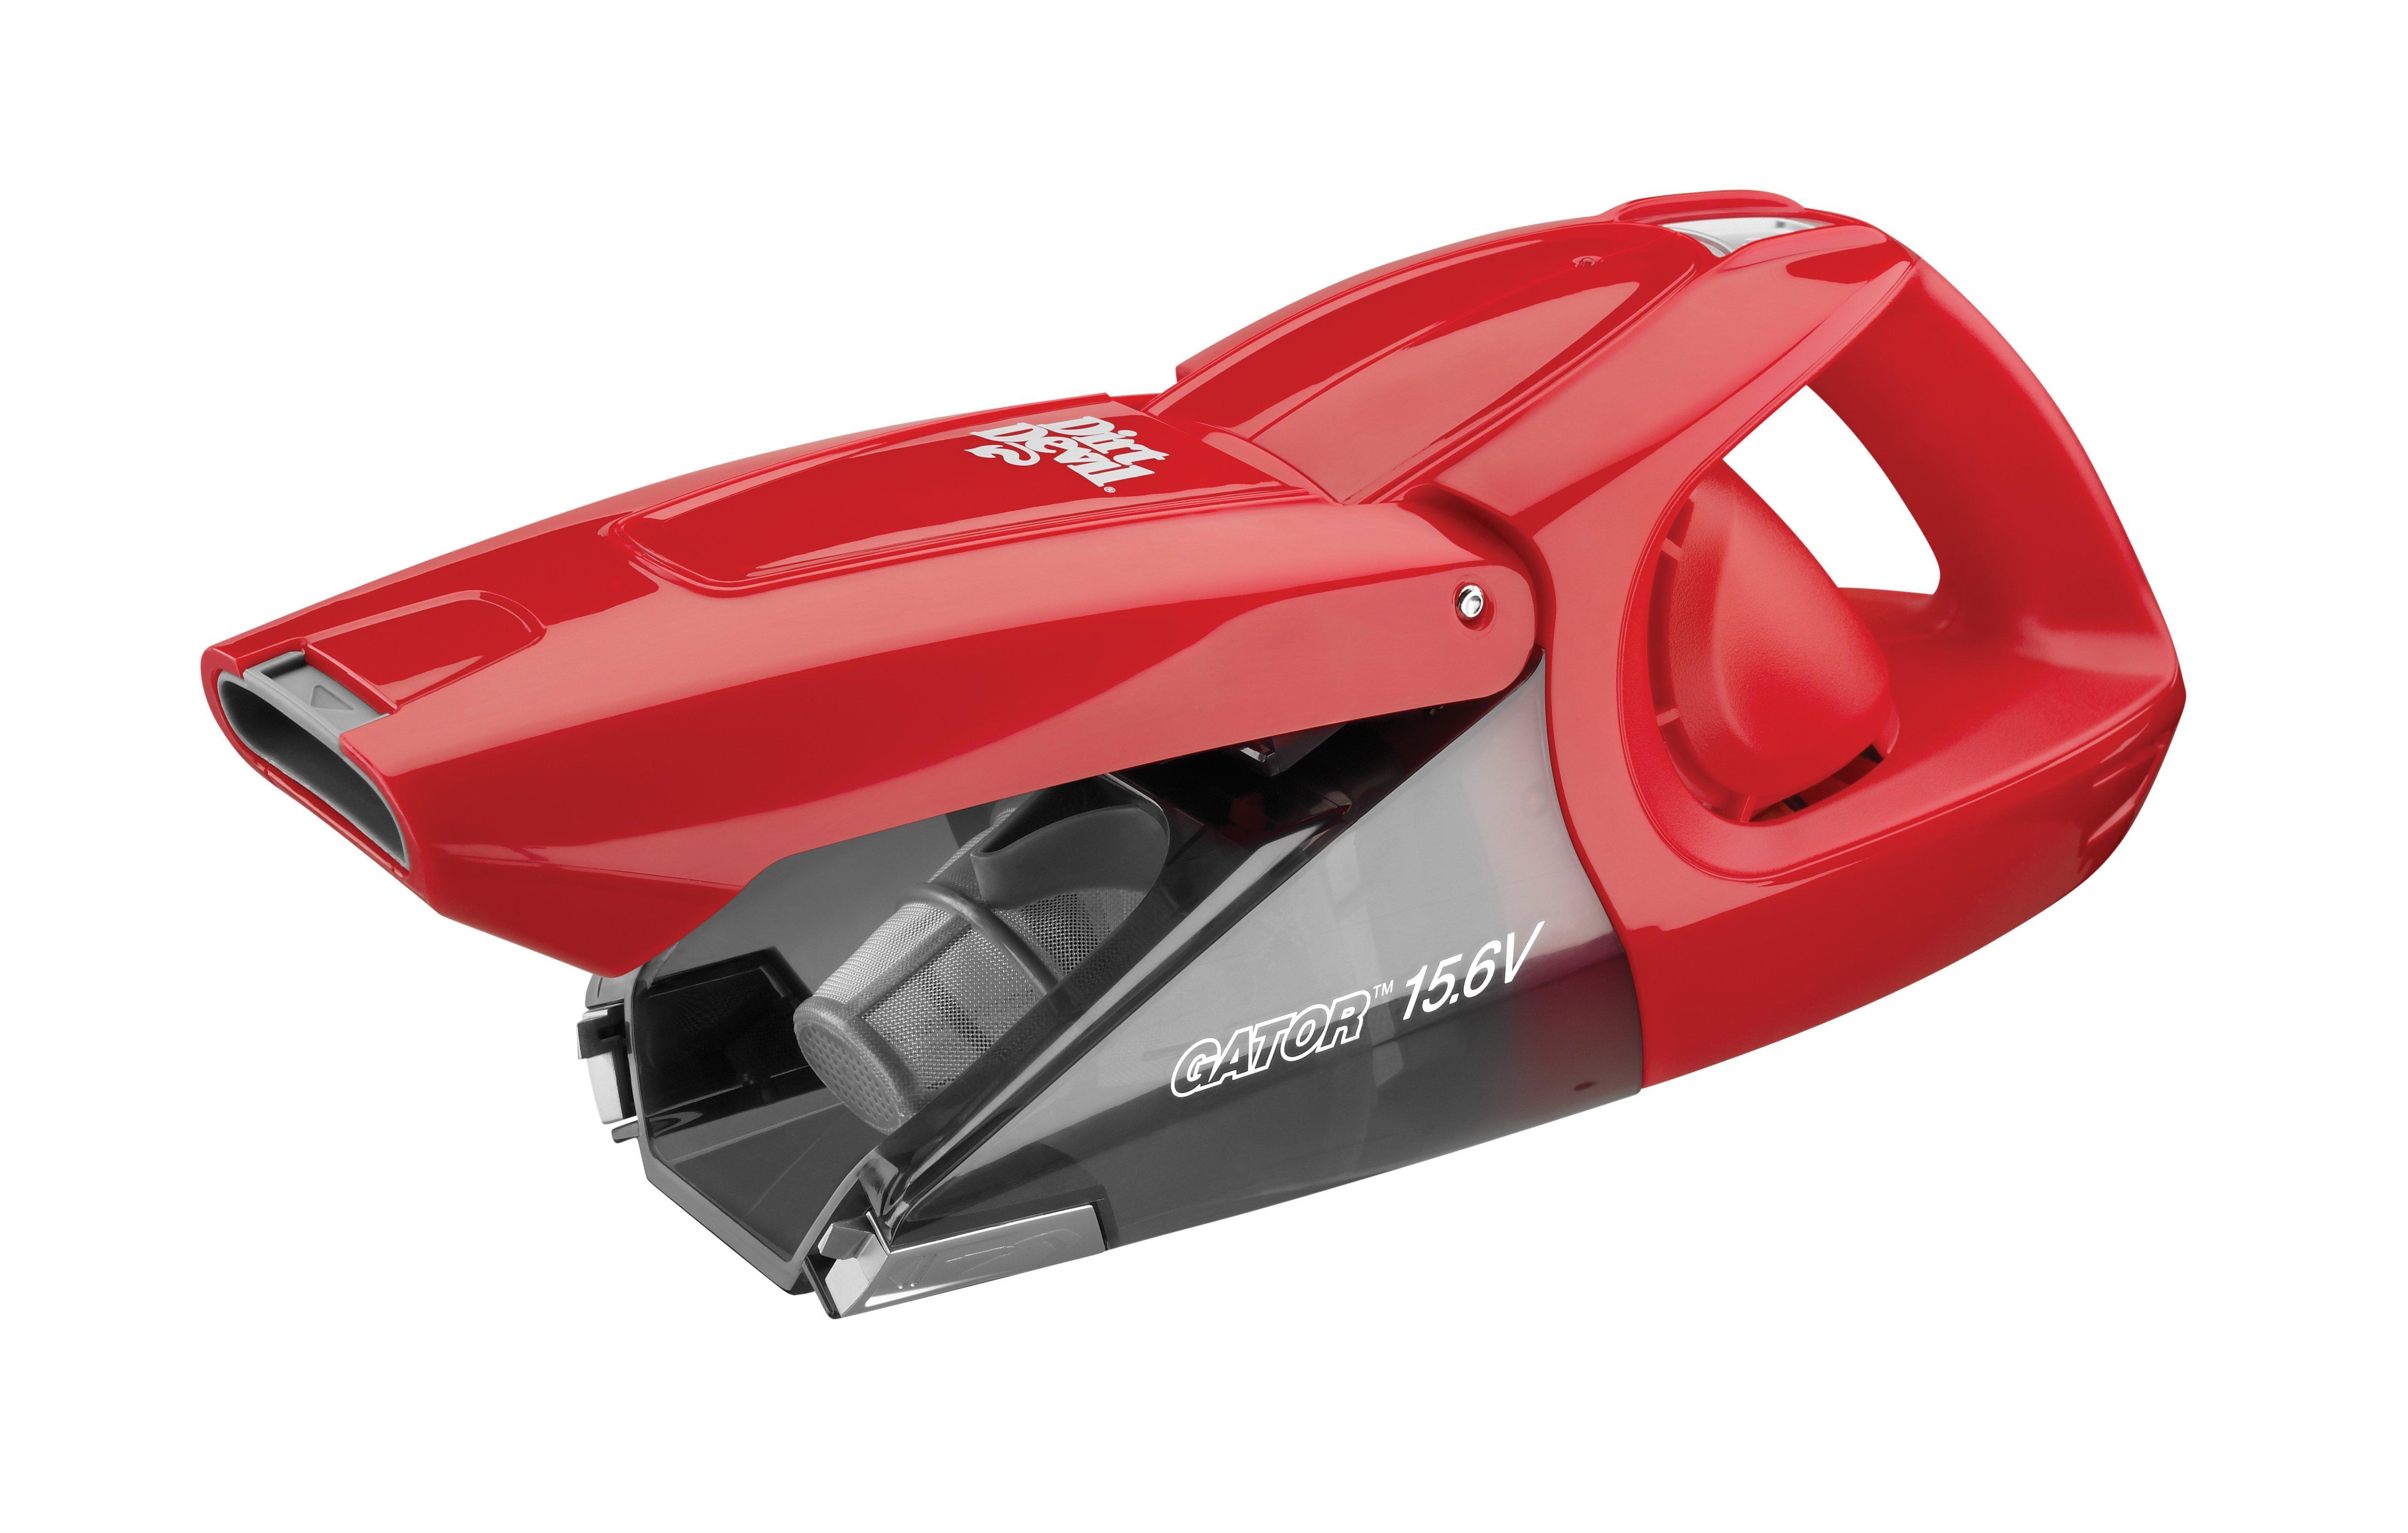 Gator 15.6V Cordless Hand Vacuum with Brushroll5